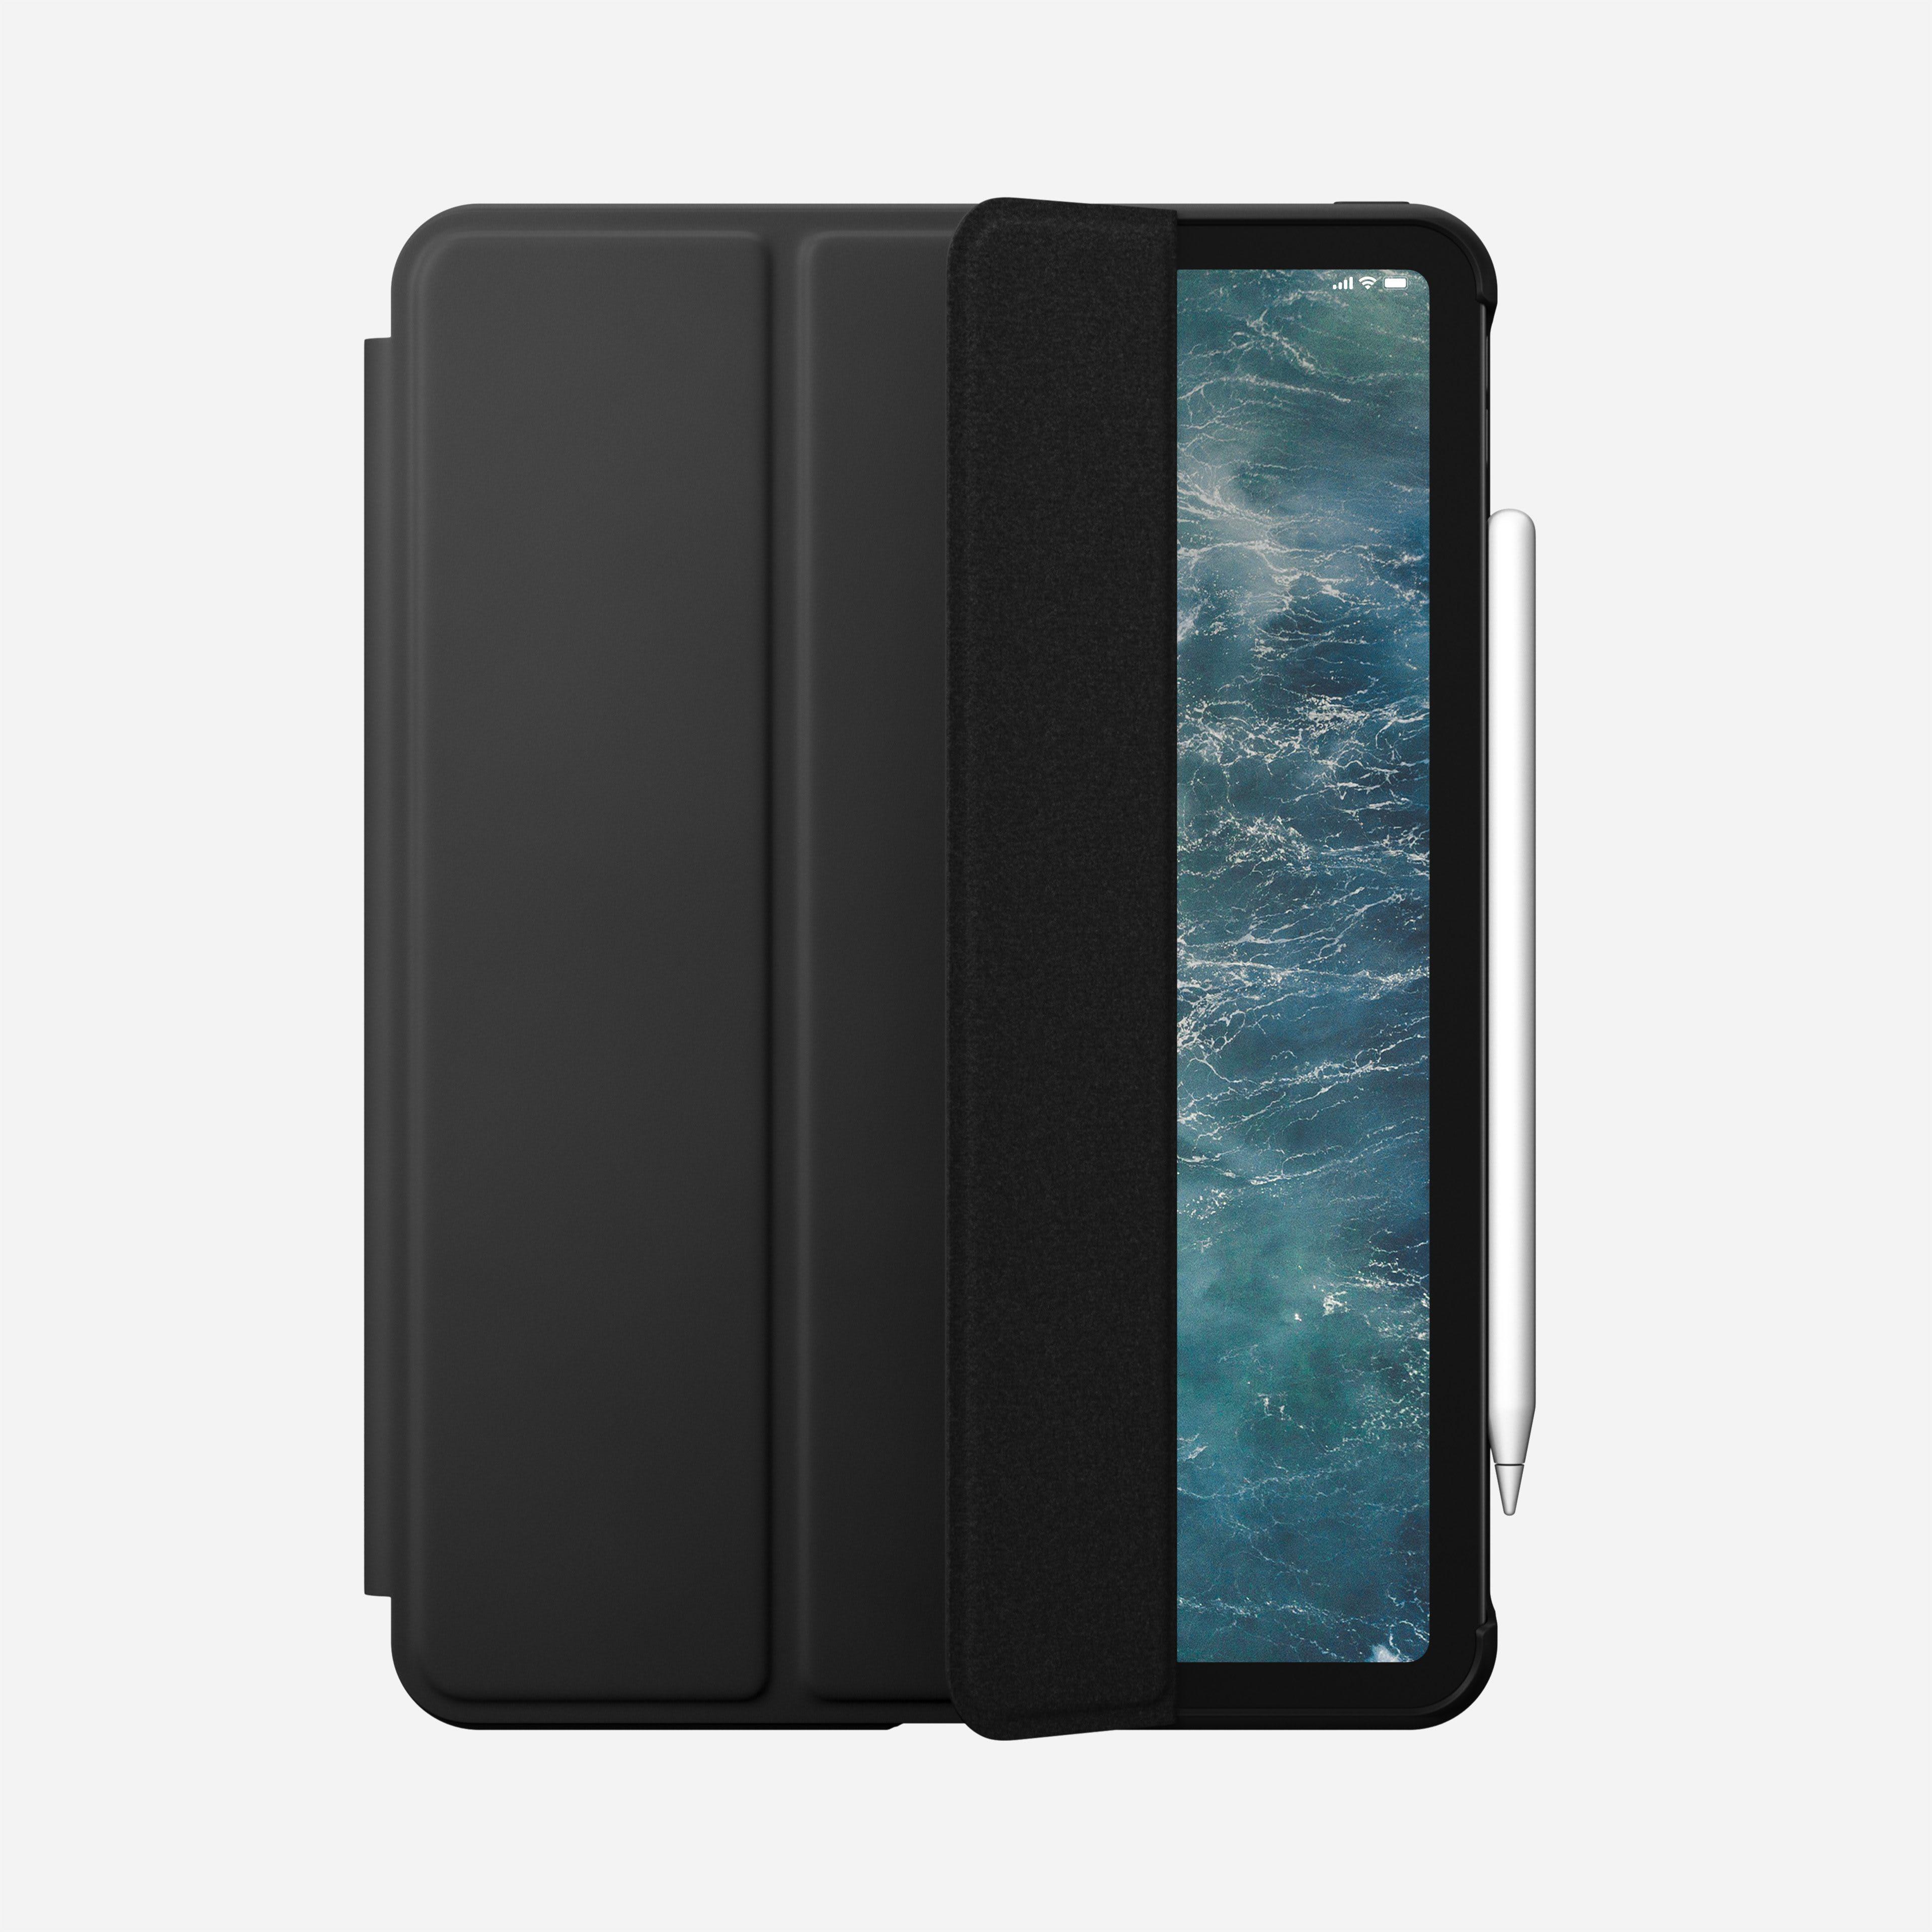 Rugged folio pu ipad pro 11 inch 2nd generation